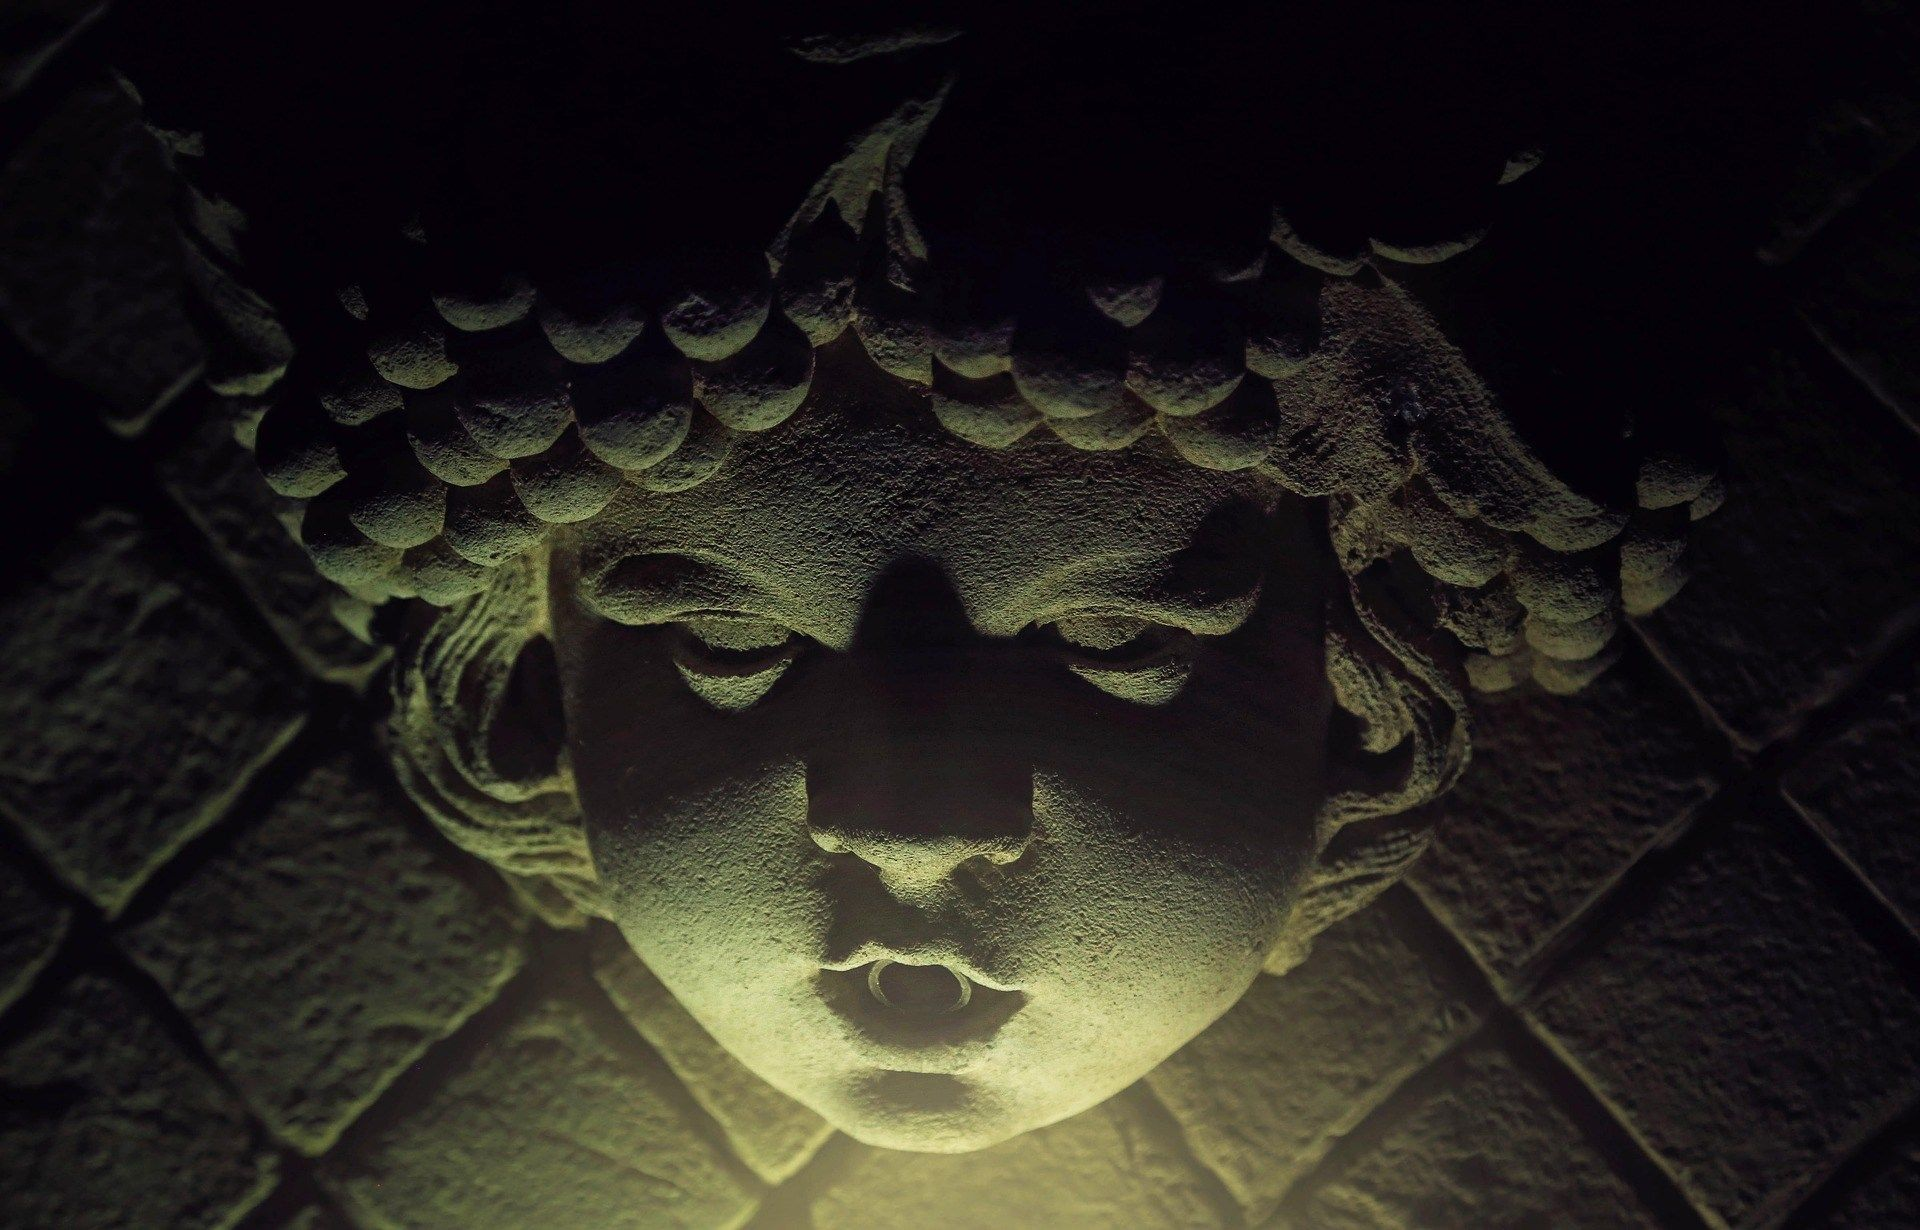 1920x1230 Px HQ RES Gothic Wallpaper By Nakisha Kingsman For Pocketfullofgrace